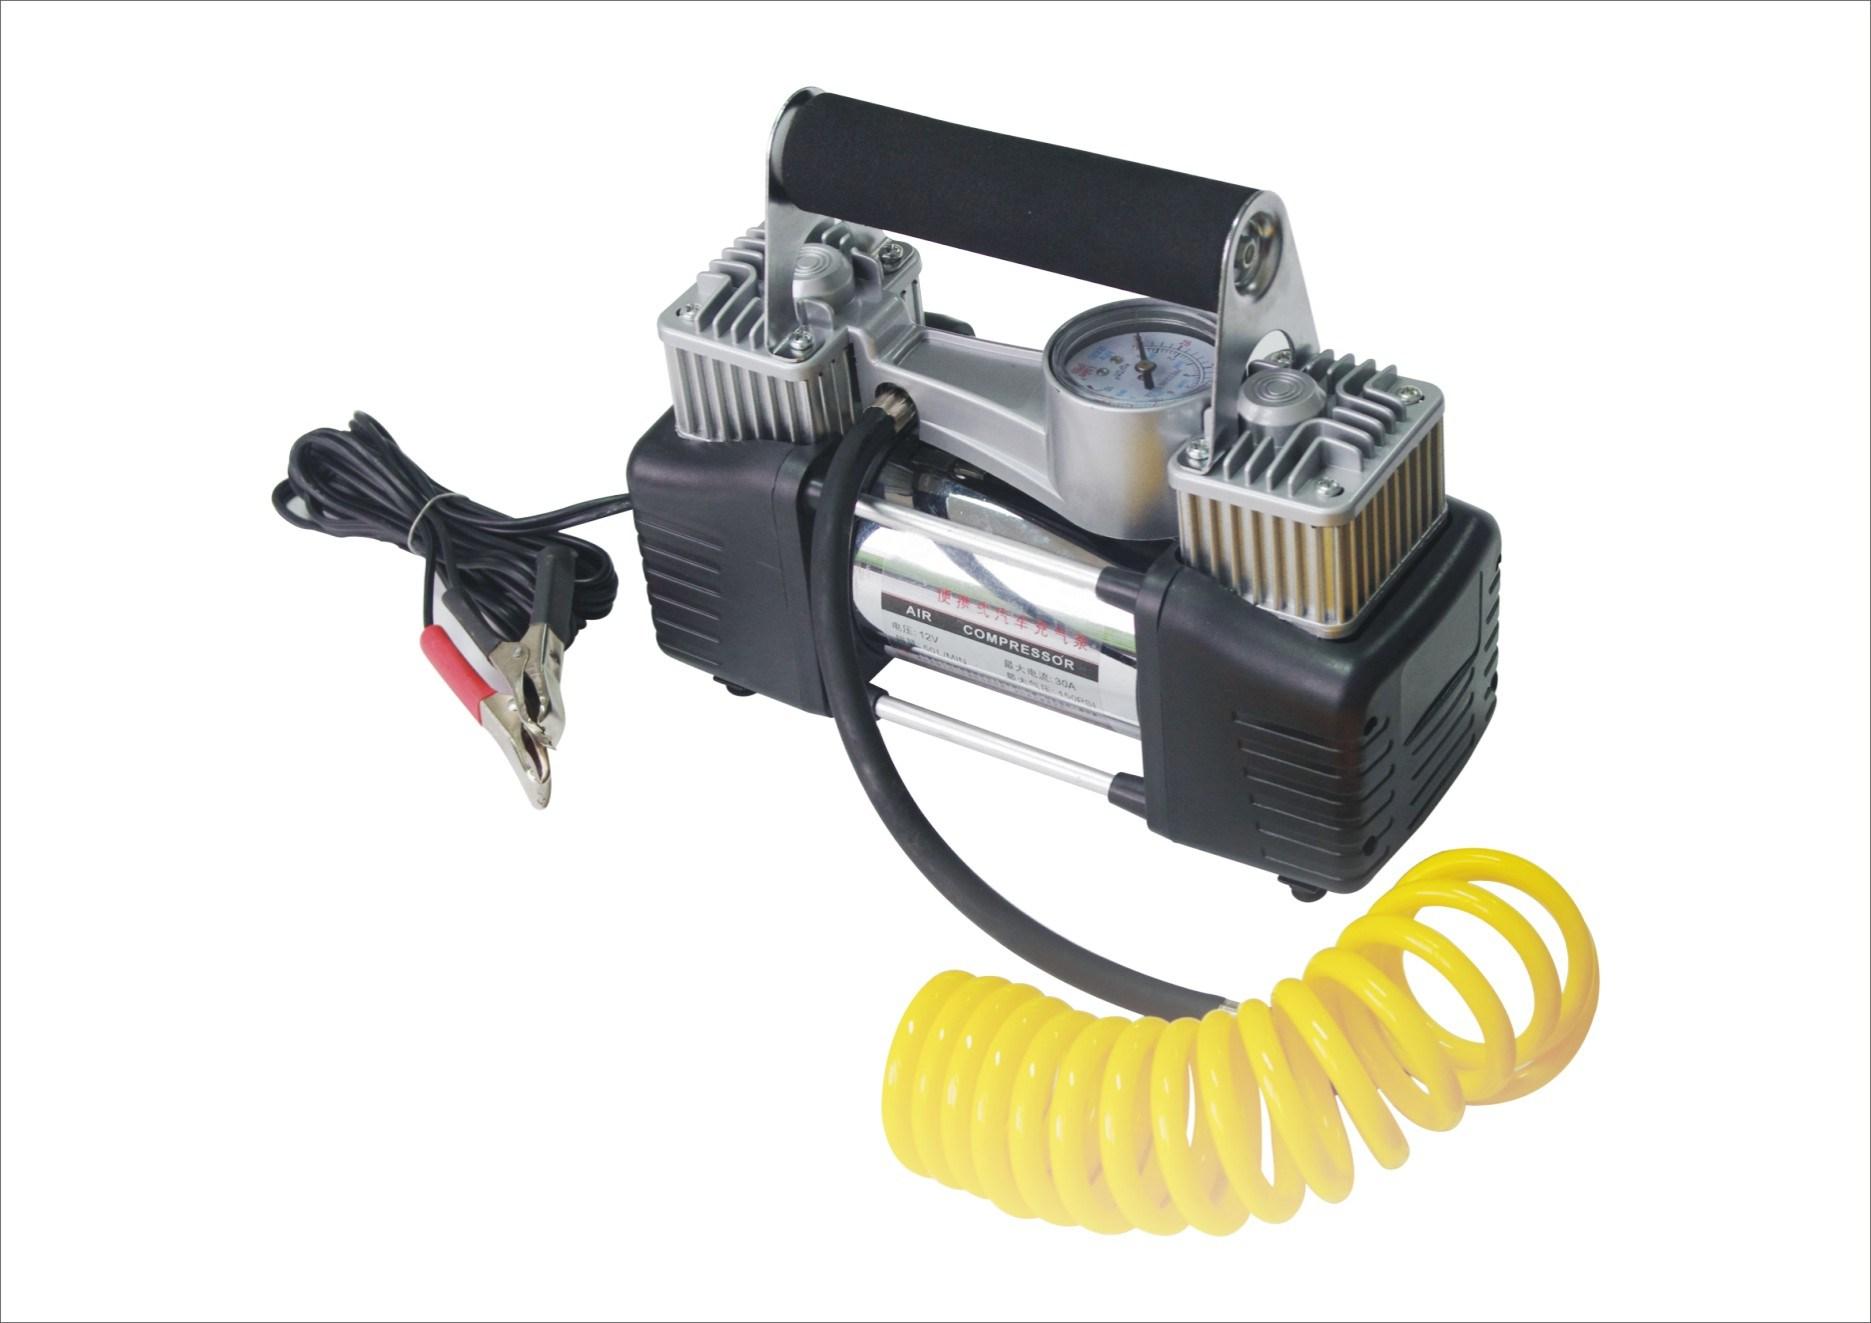 DC12V 150psi Mini Air Compressor for Car